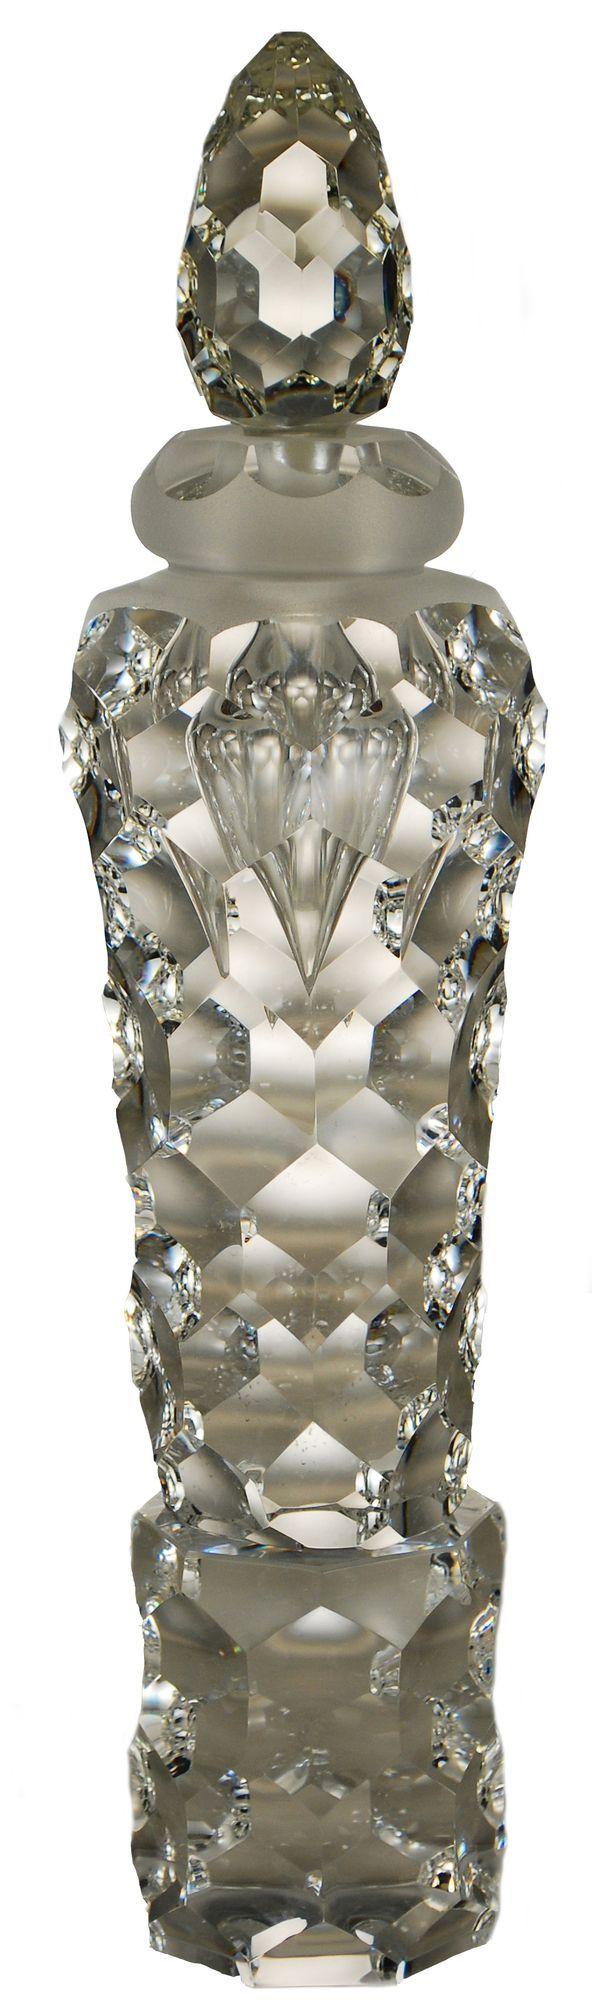 perfumeros goticos antiguos cristal - Buscar con Google